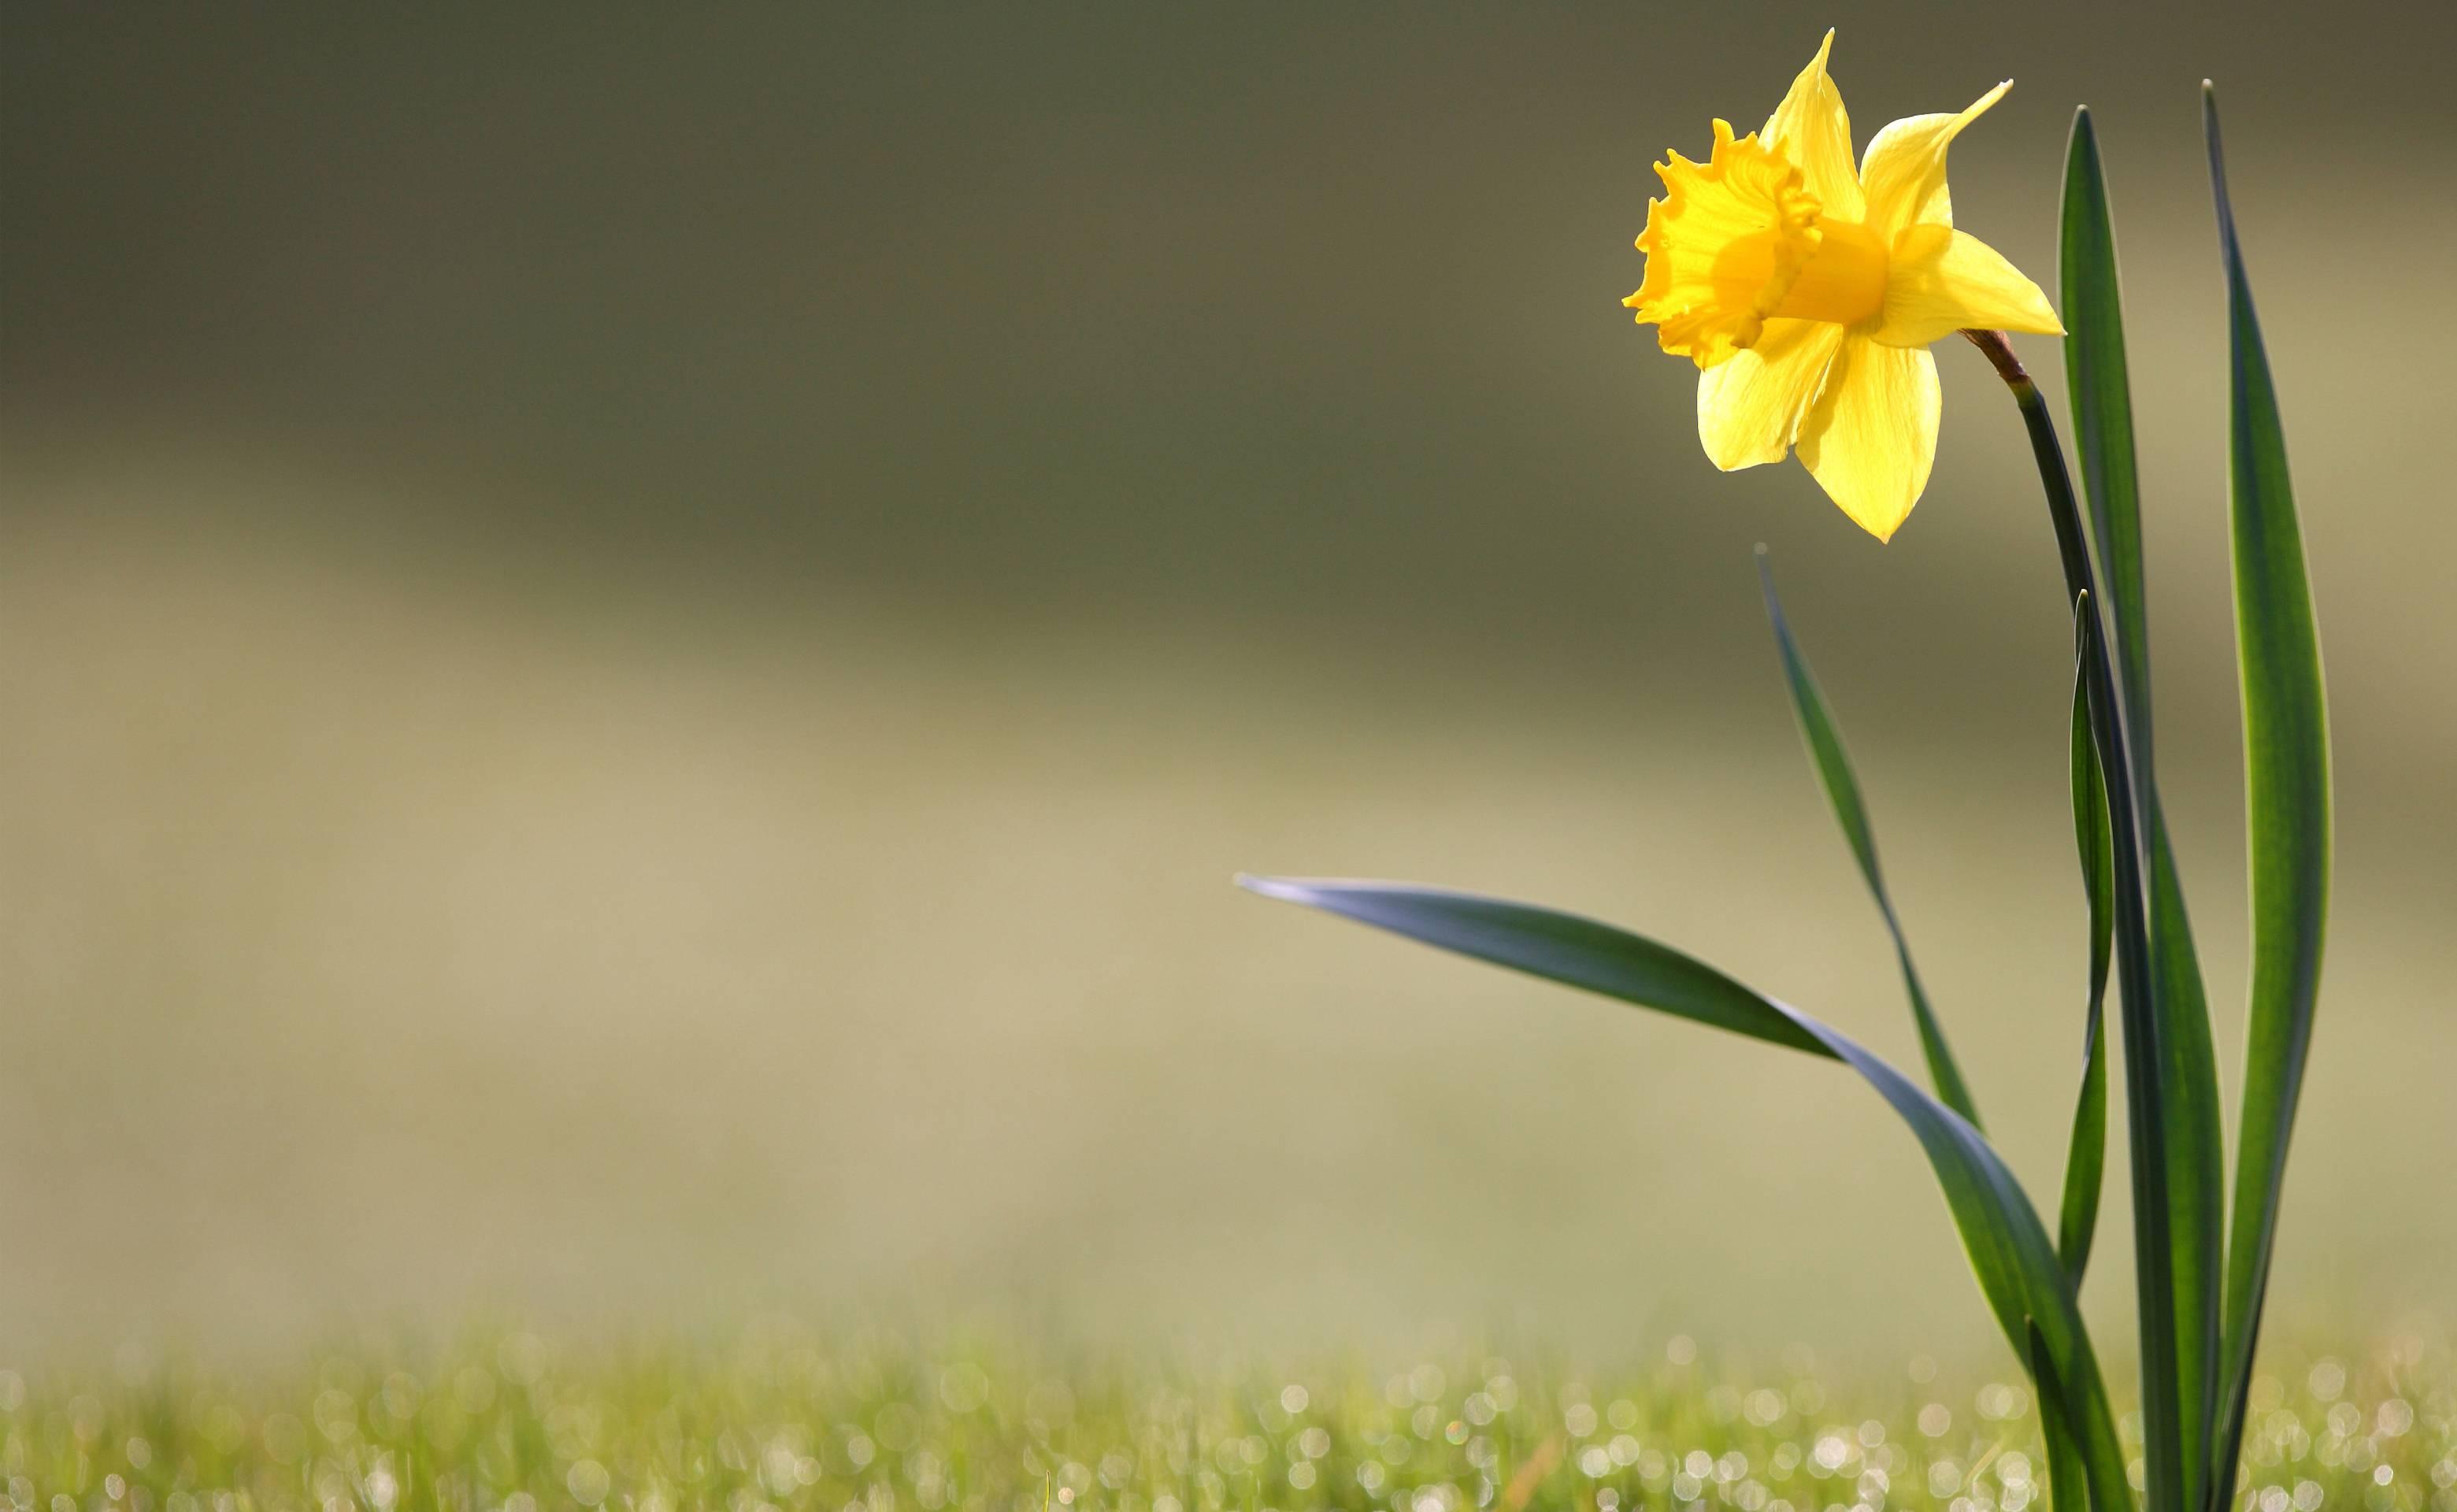 download daffodils 1920x1080 wallpaper - photo #11